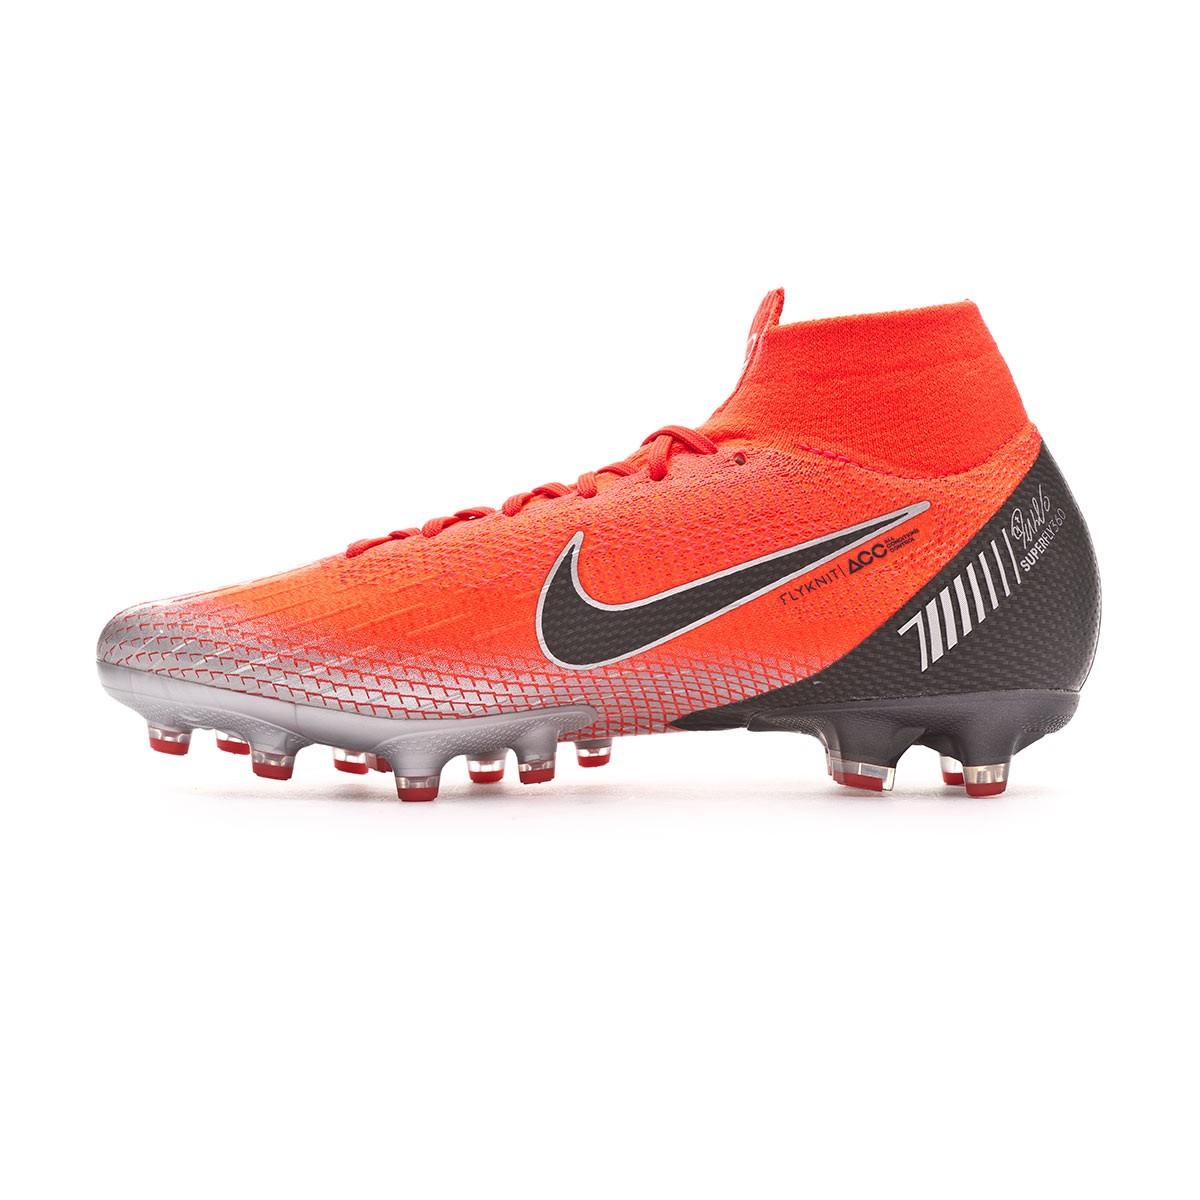 lowest price 5ac98 7f0ae Bota de fútbol Nike Mercurial Superfly VI Elite CR7 AG-Pro Flash crimson- Black-Total crimson - Tienda de fútbol Fútbol Emotion